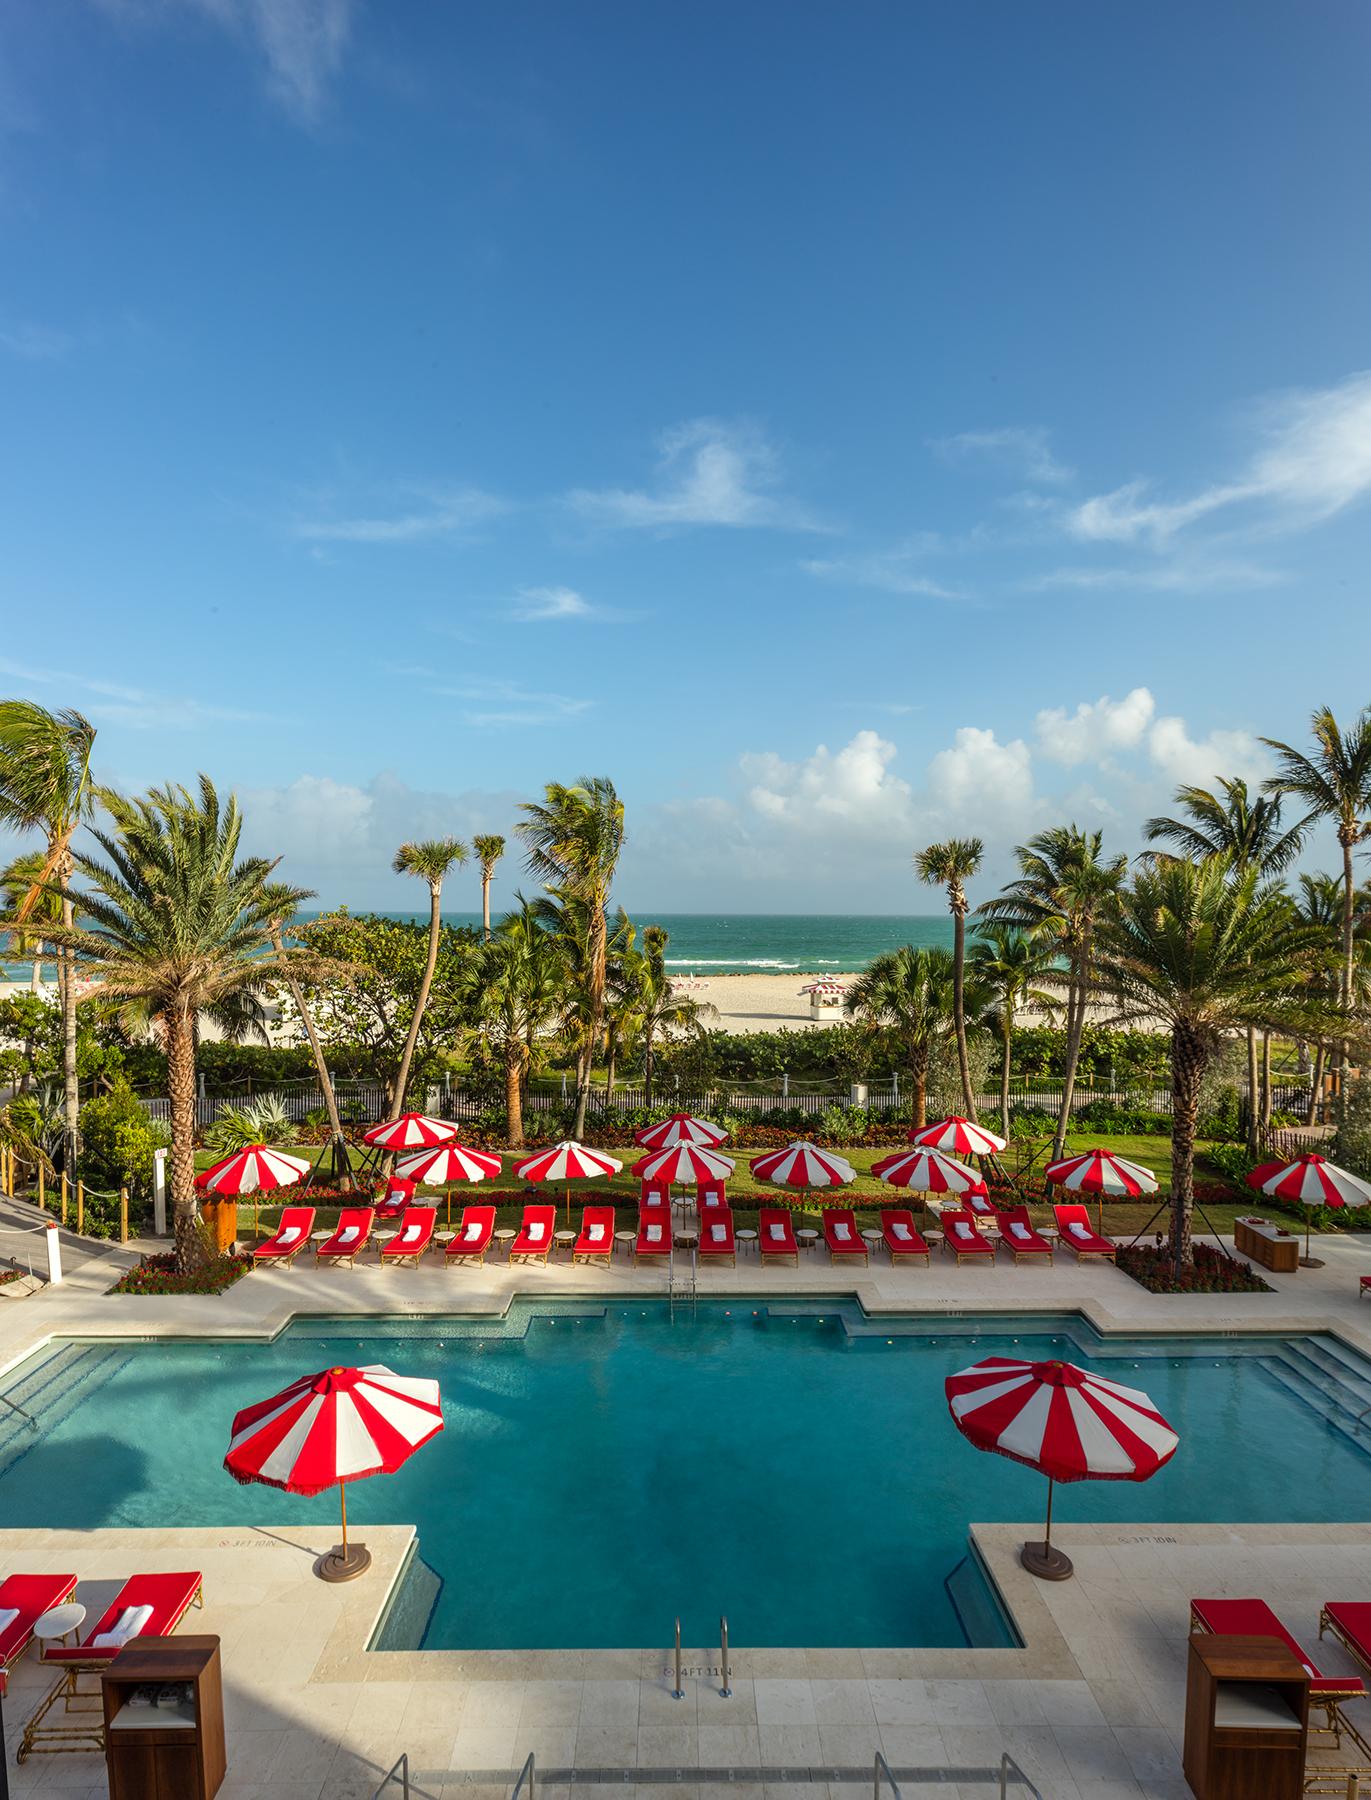 Faena Hotel Pool_Photo by Todd Eberle.jpg